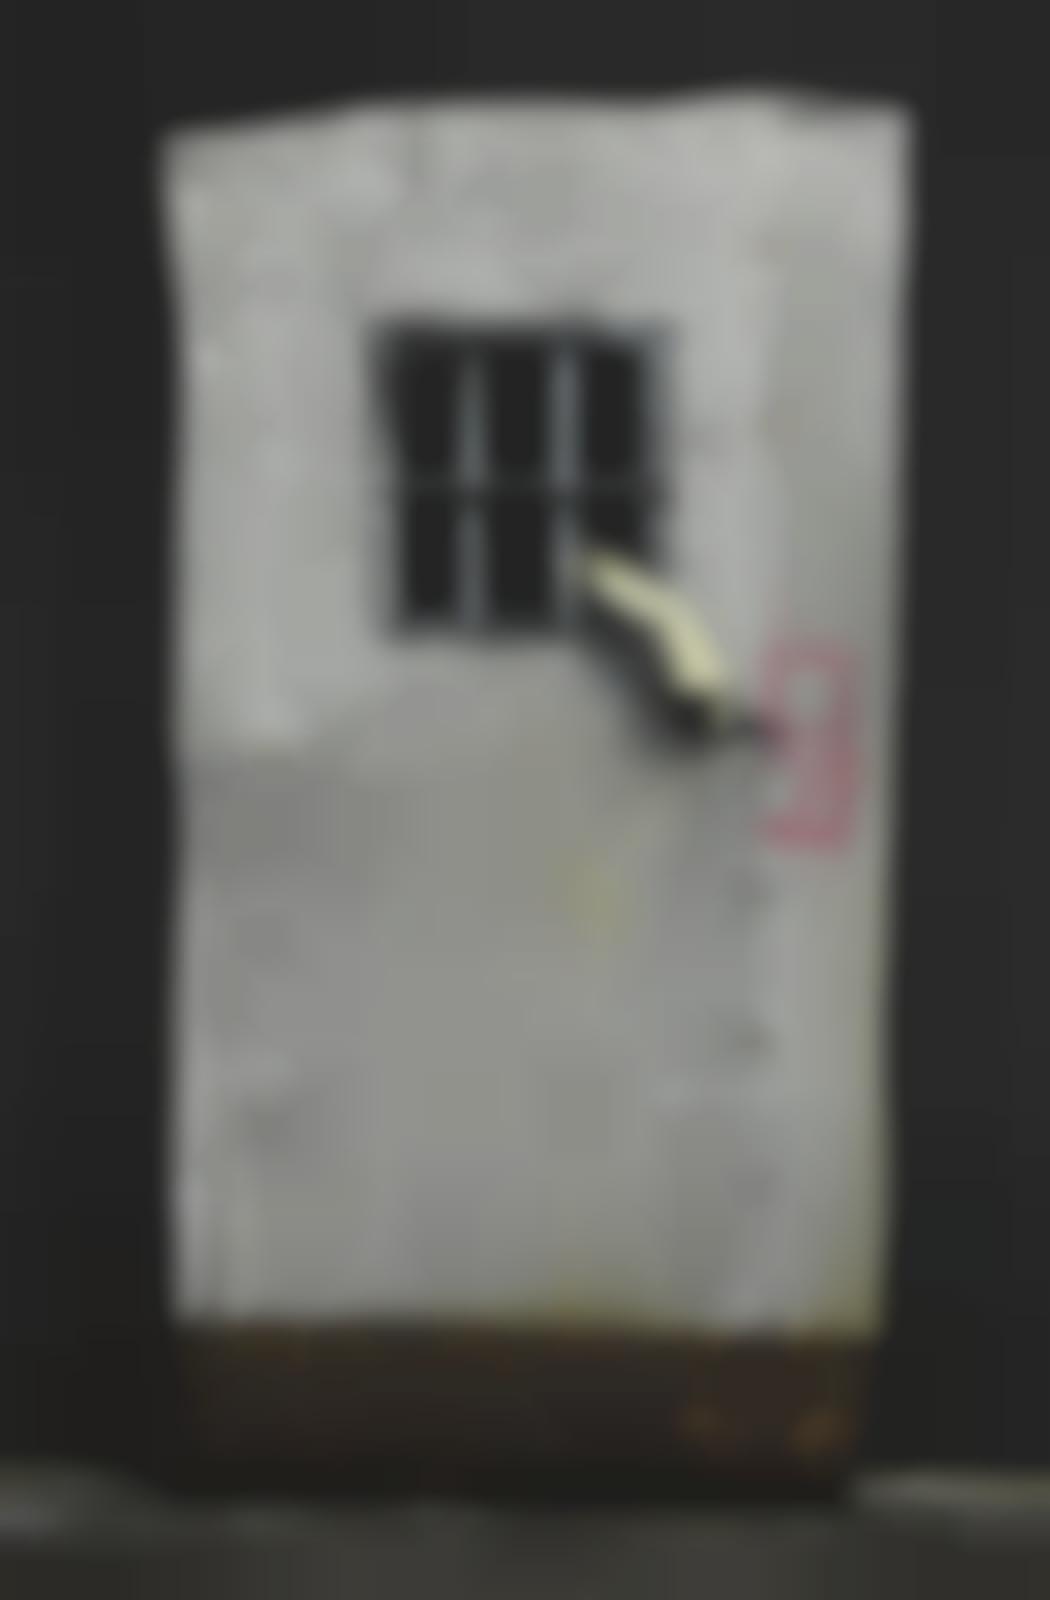 Banksy-Jail Break-2010